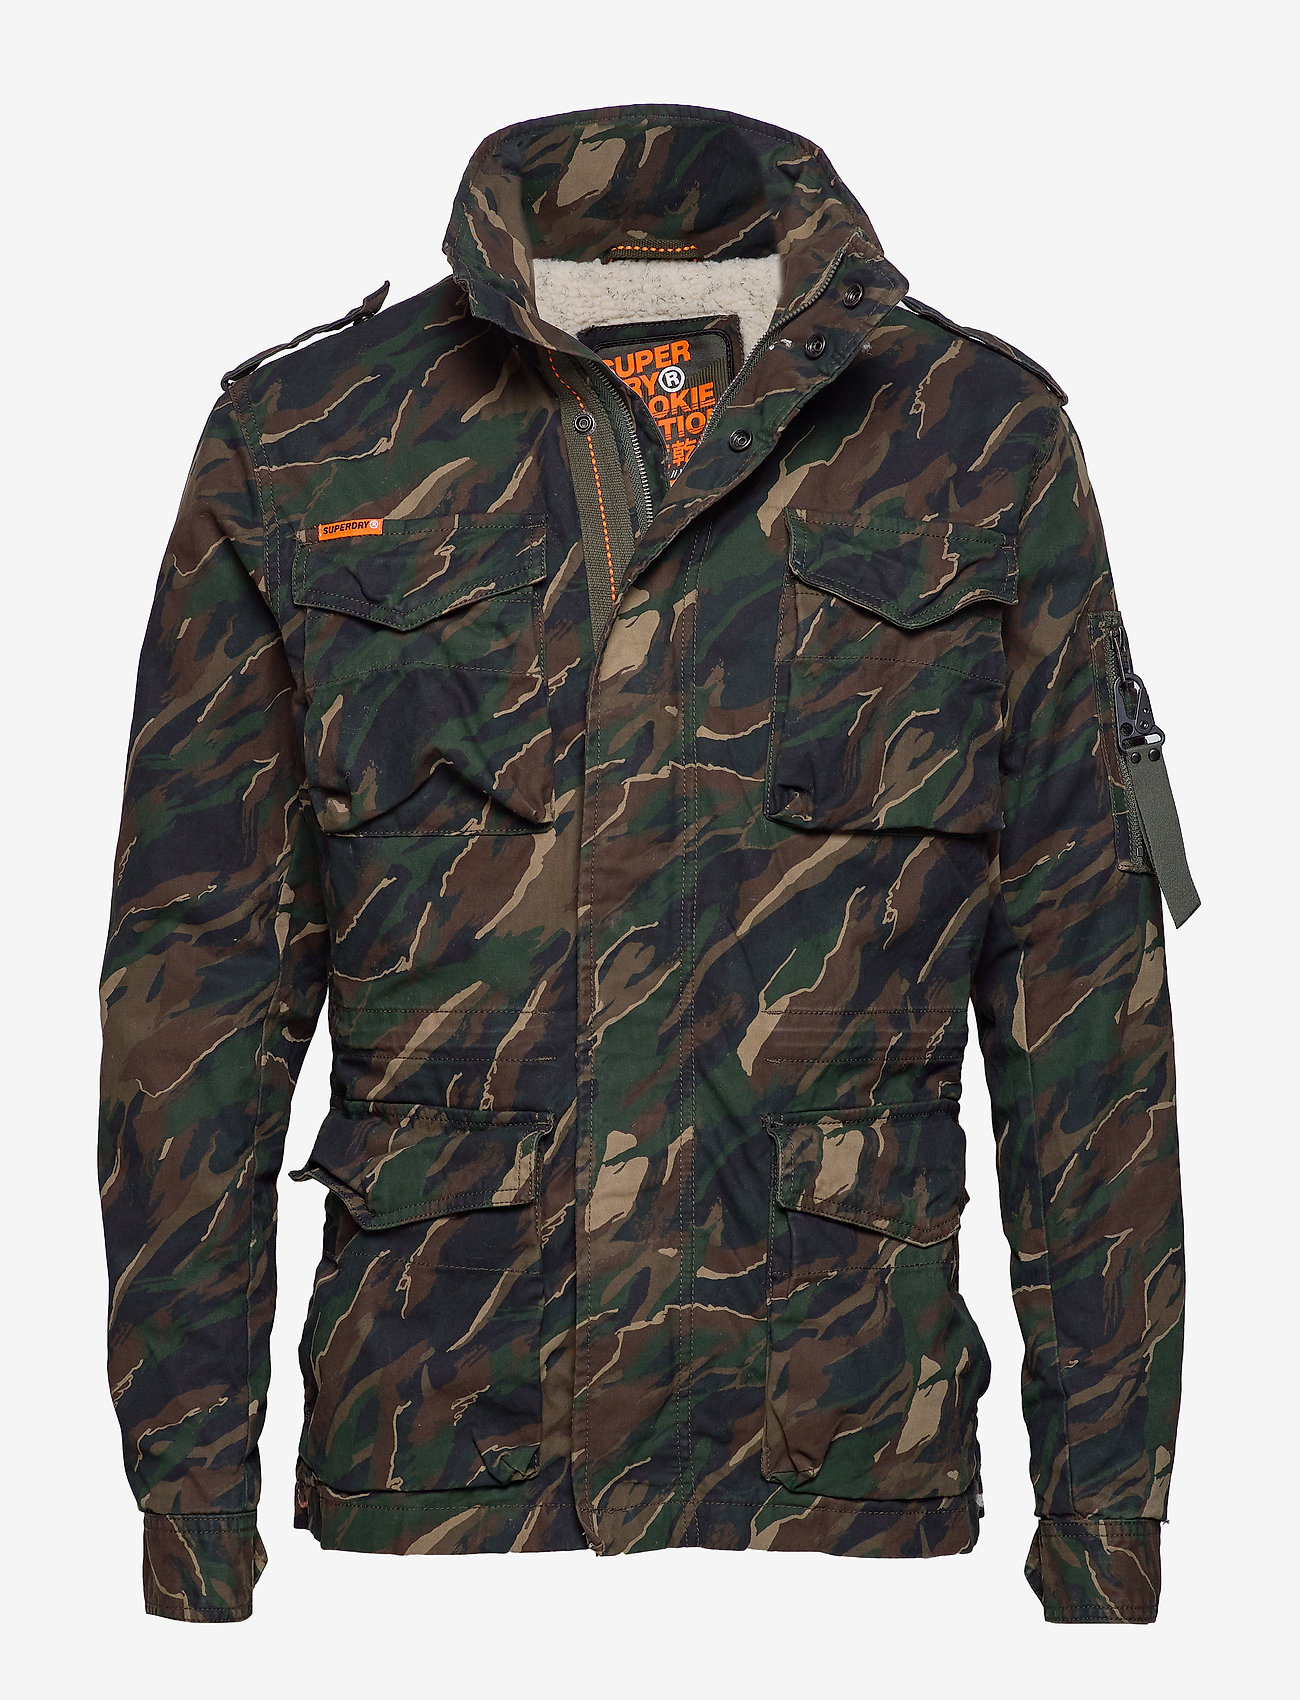 Superdry - CLASSIC ROOKIE 4 POCKET JACKET - light jackets - black kho - 0